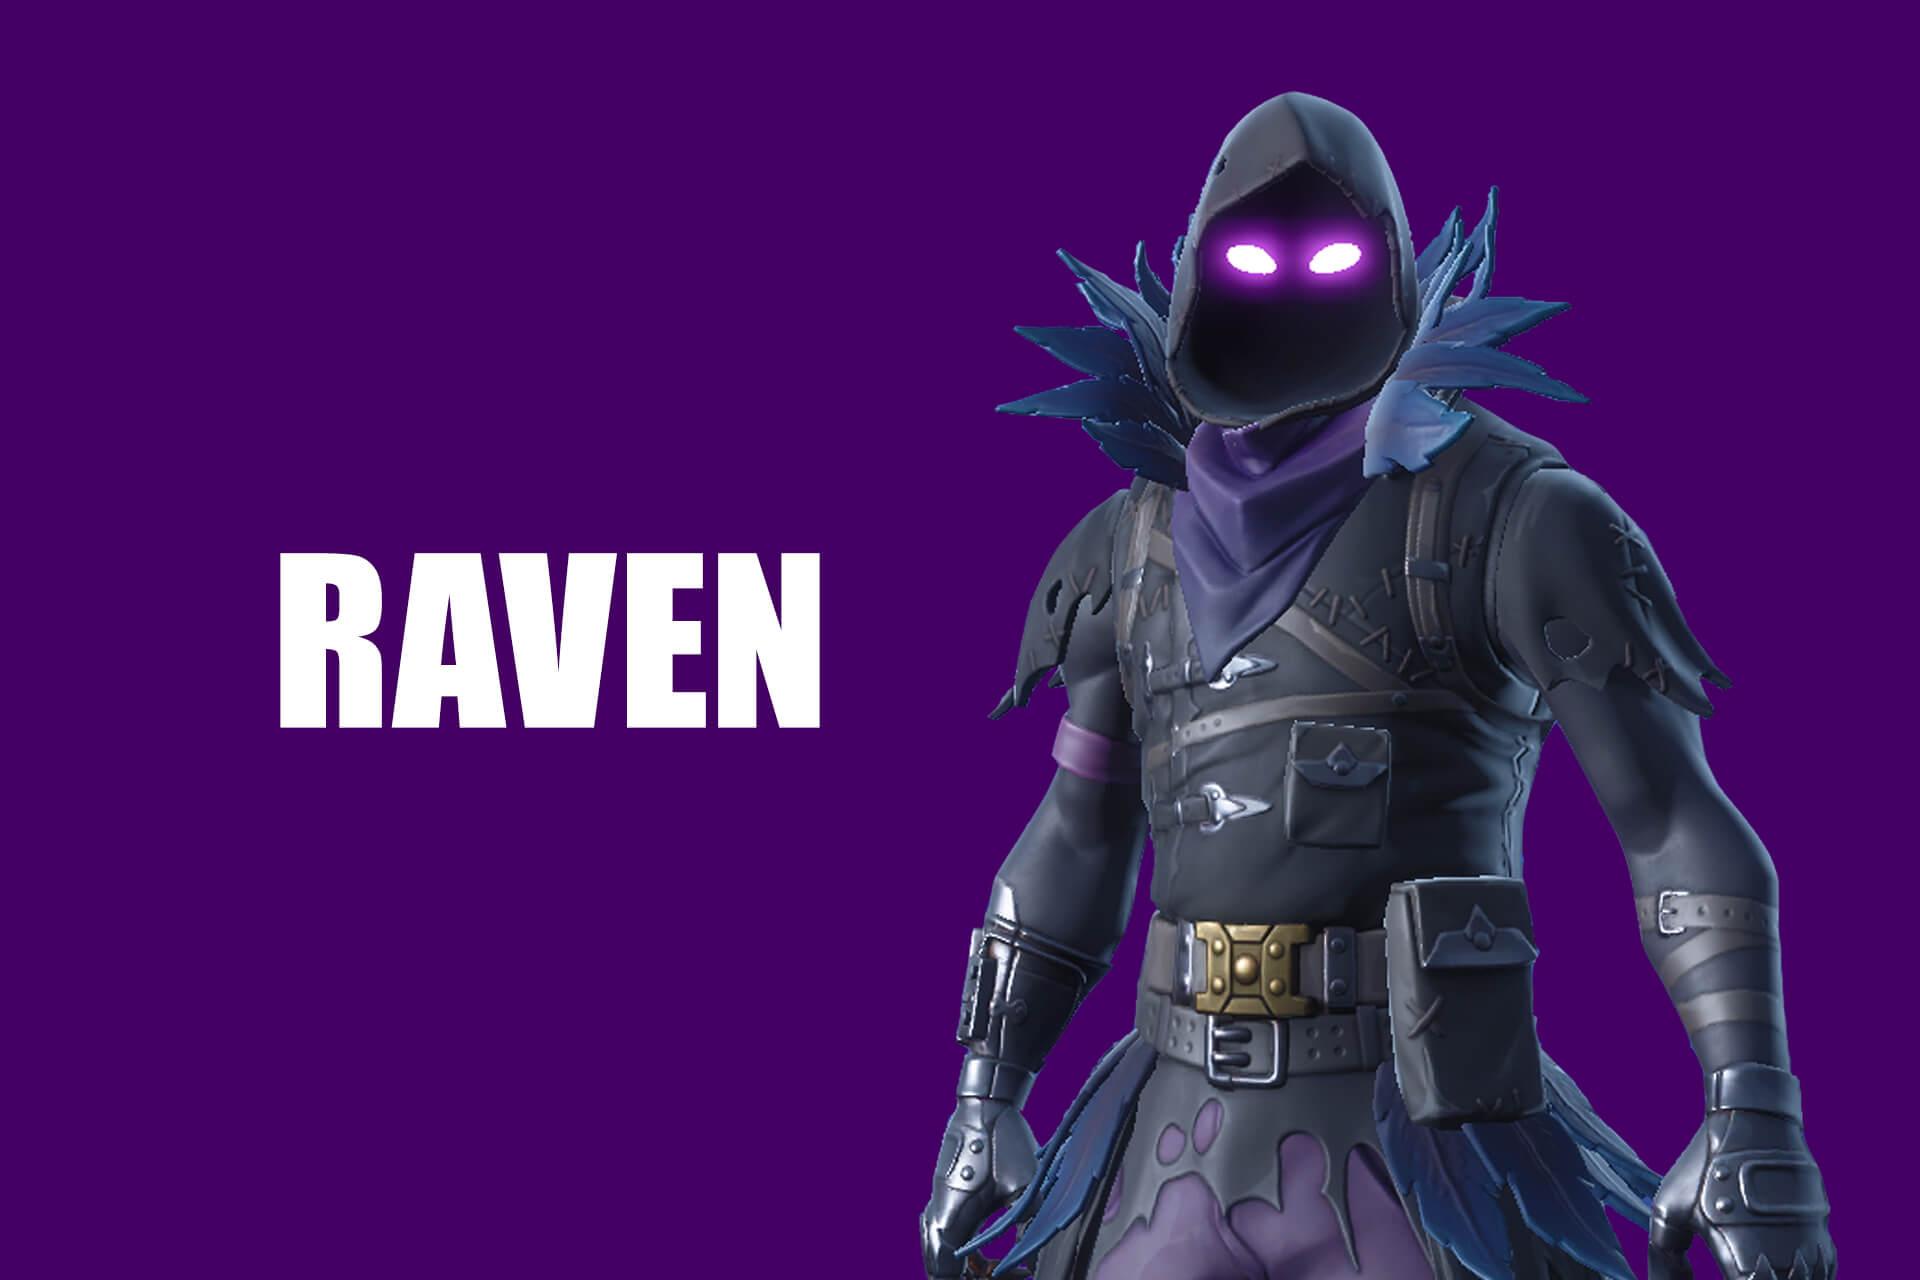 costume-raven1.jpg